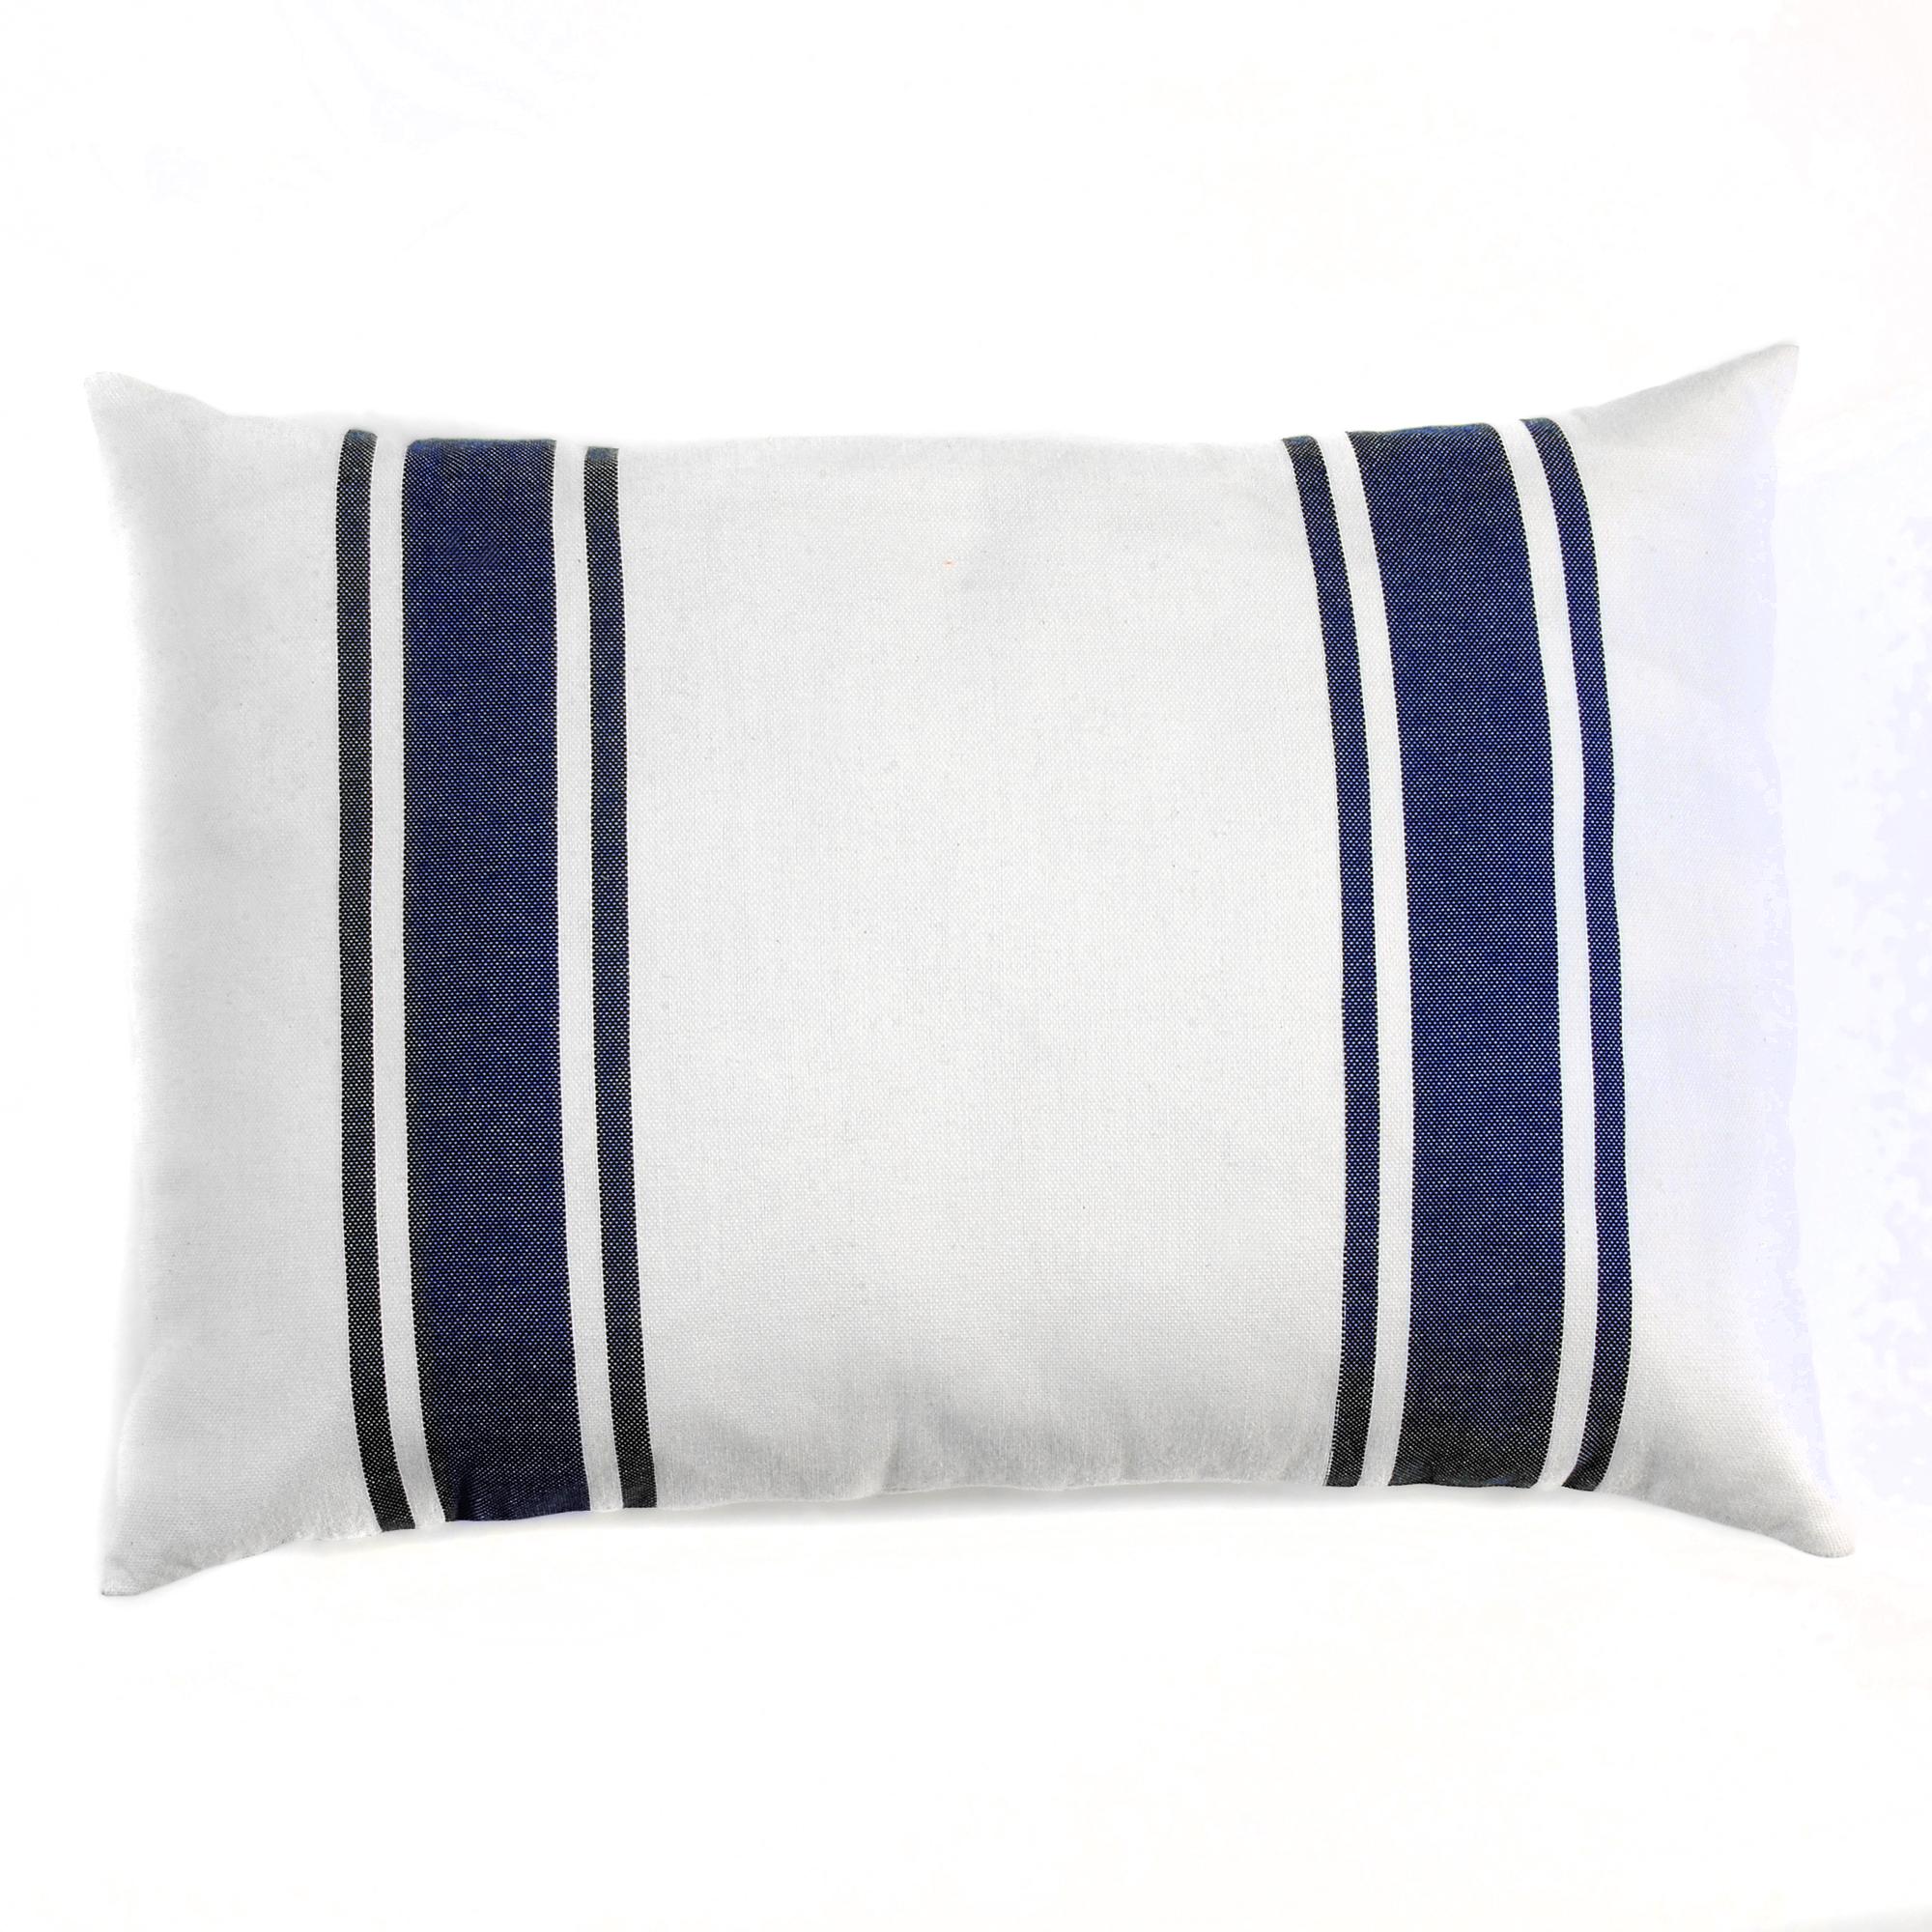 CASABLANCA - Housse de coussin coton rayures bleu fond blanc 35 x 50